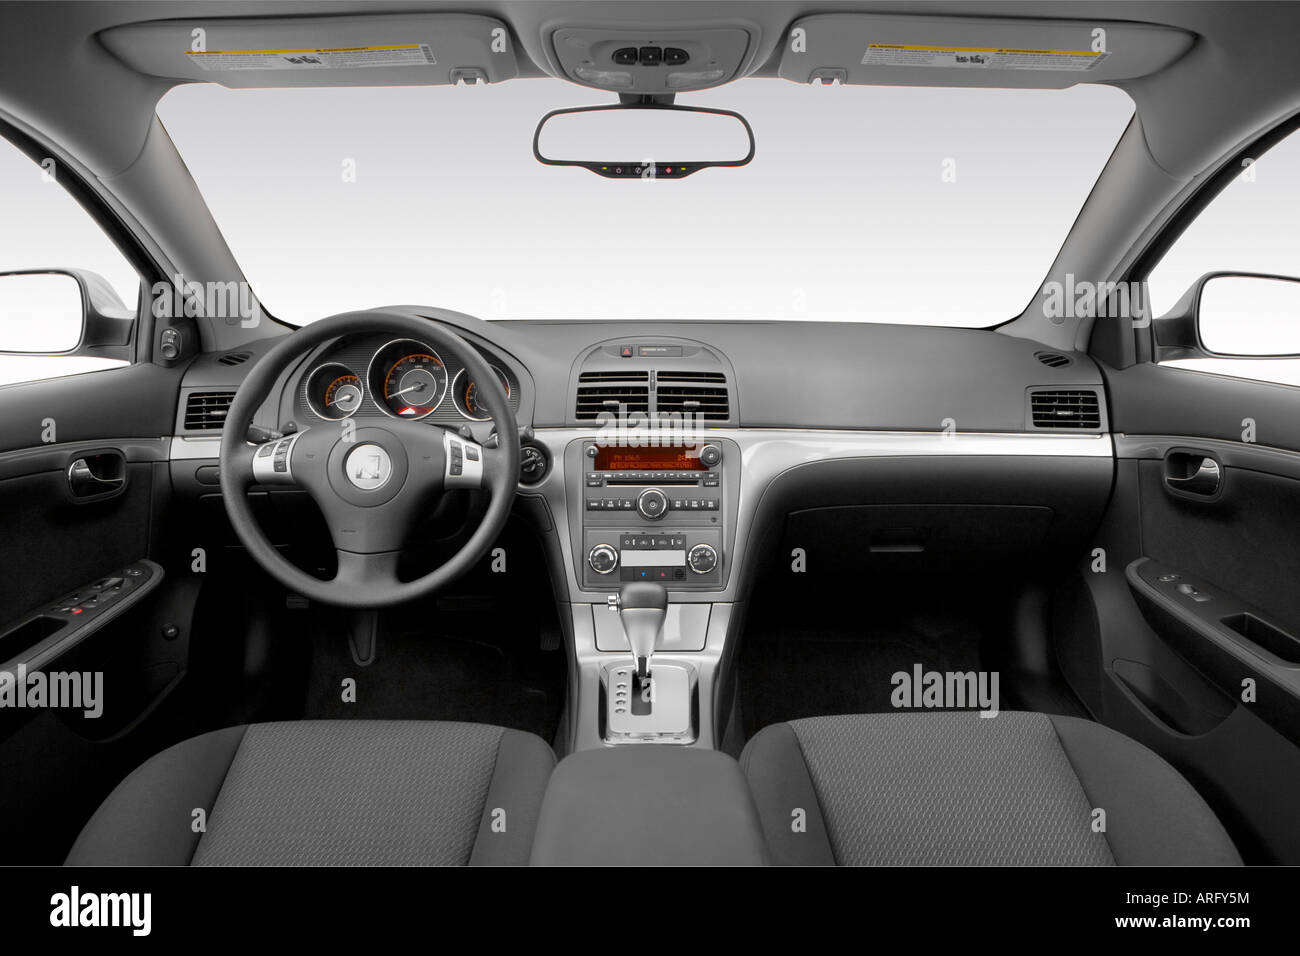 2007 saturn aura xr in silver dashboard center console gear shifter view